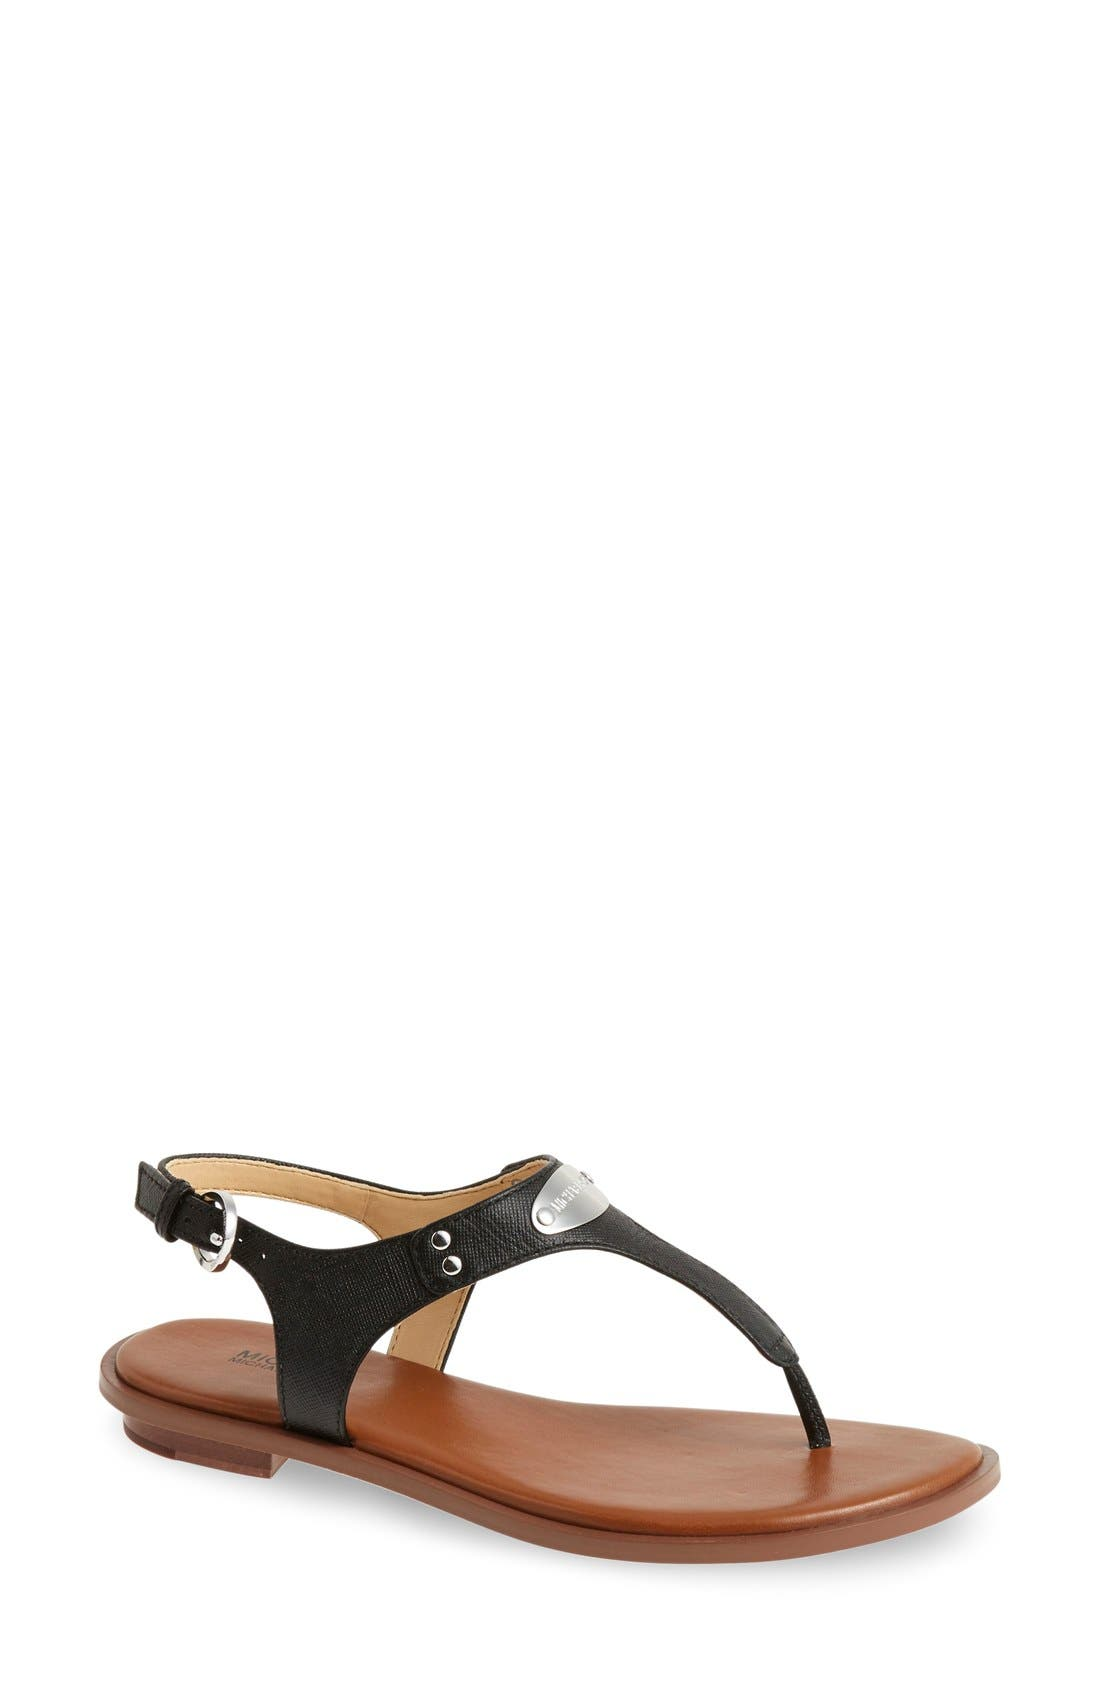 'Plate' Thong Sandal,                             Main thumbnail 1, color,                             BLACK